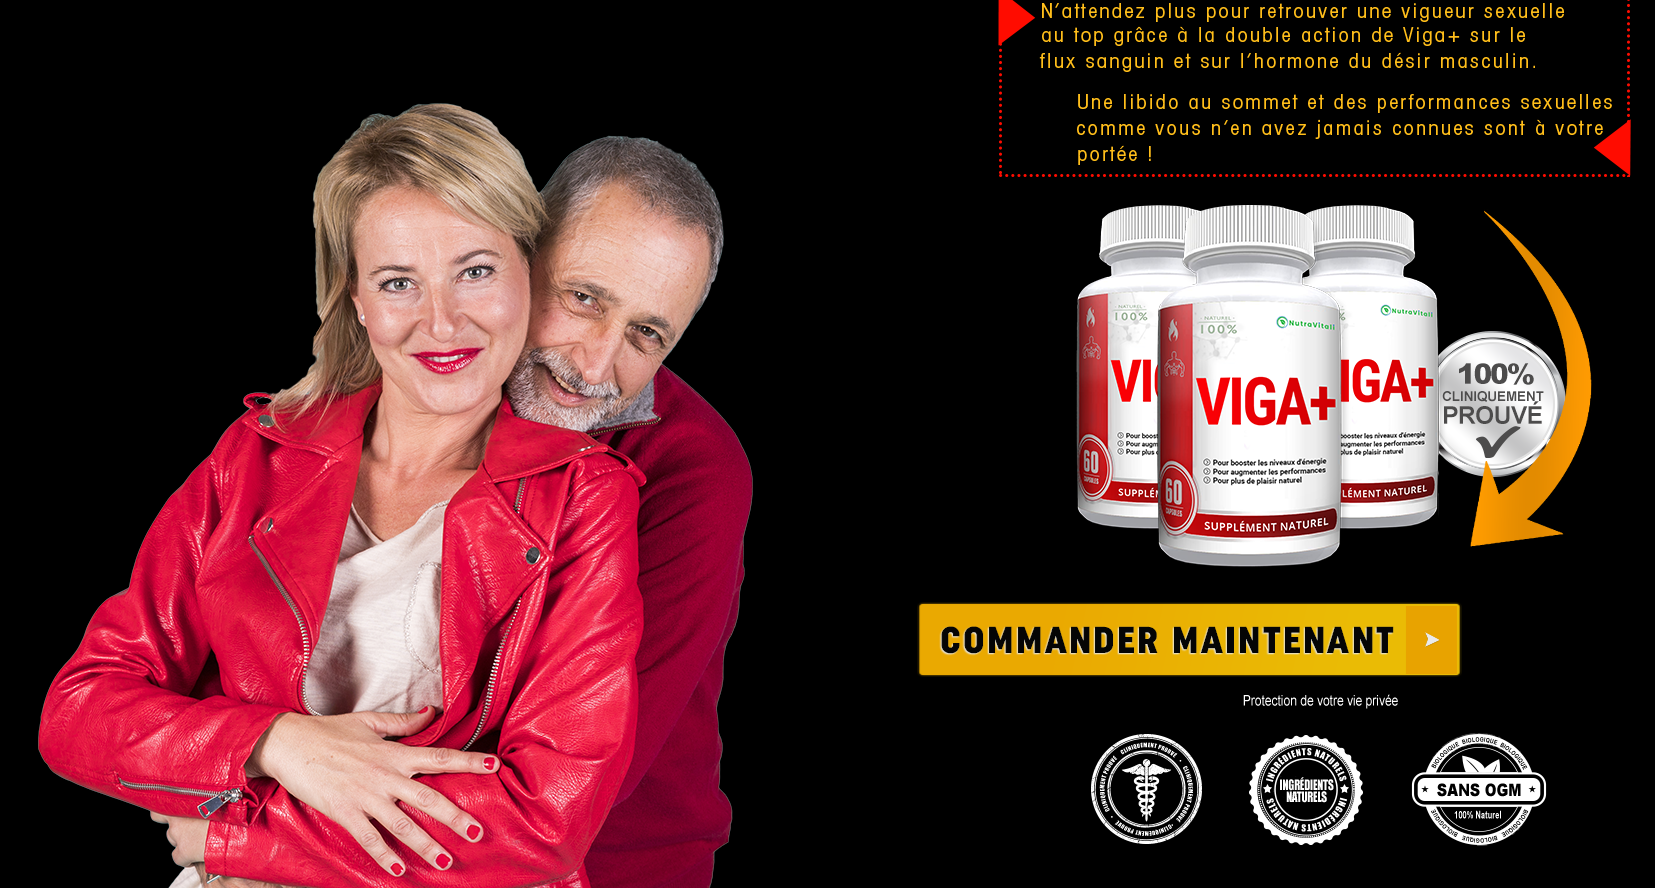 http://www.supplementalreviews.com/viga-plus-france/ in 2020 Male enhancement Enhancement